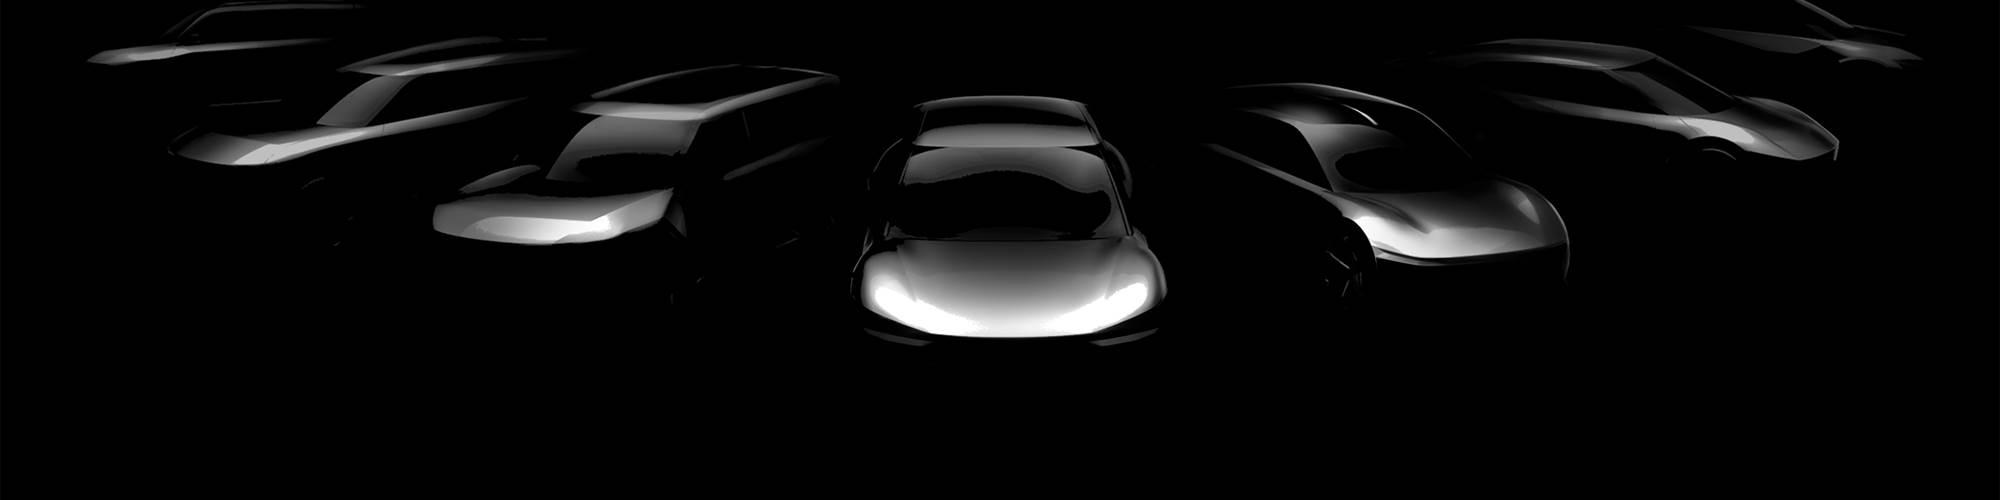 Kia's new dedicated electric vehicles